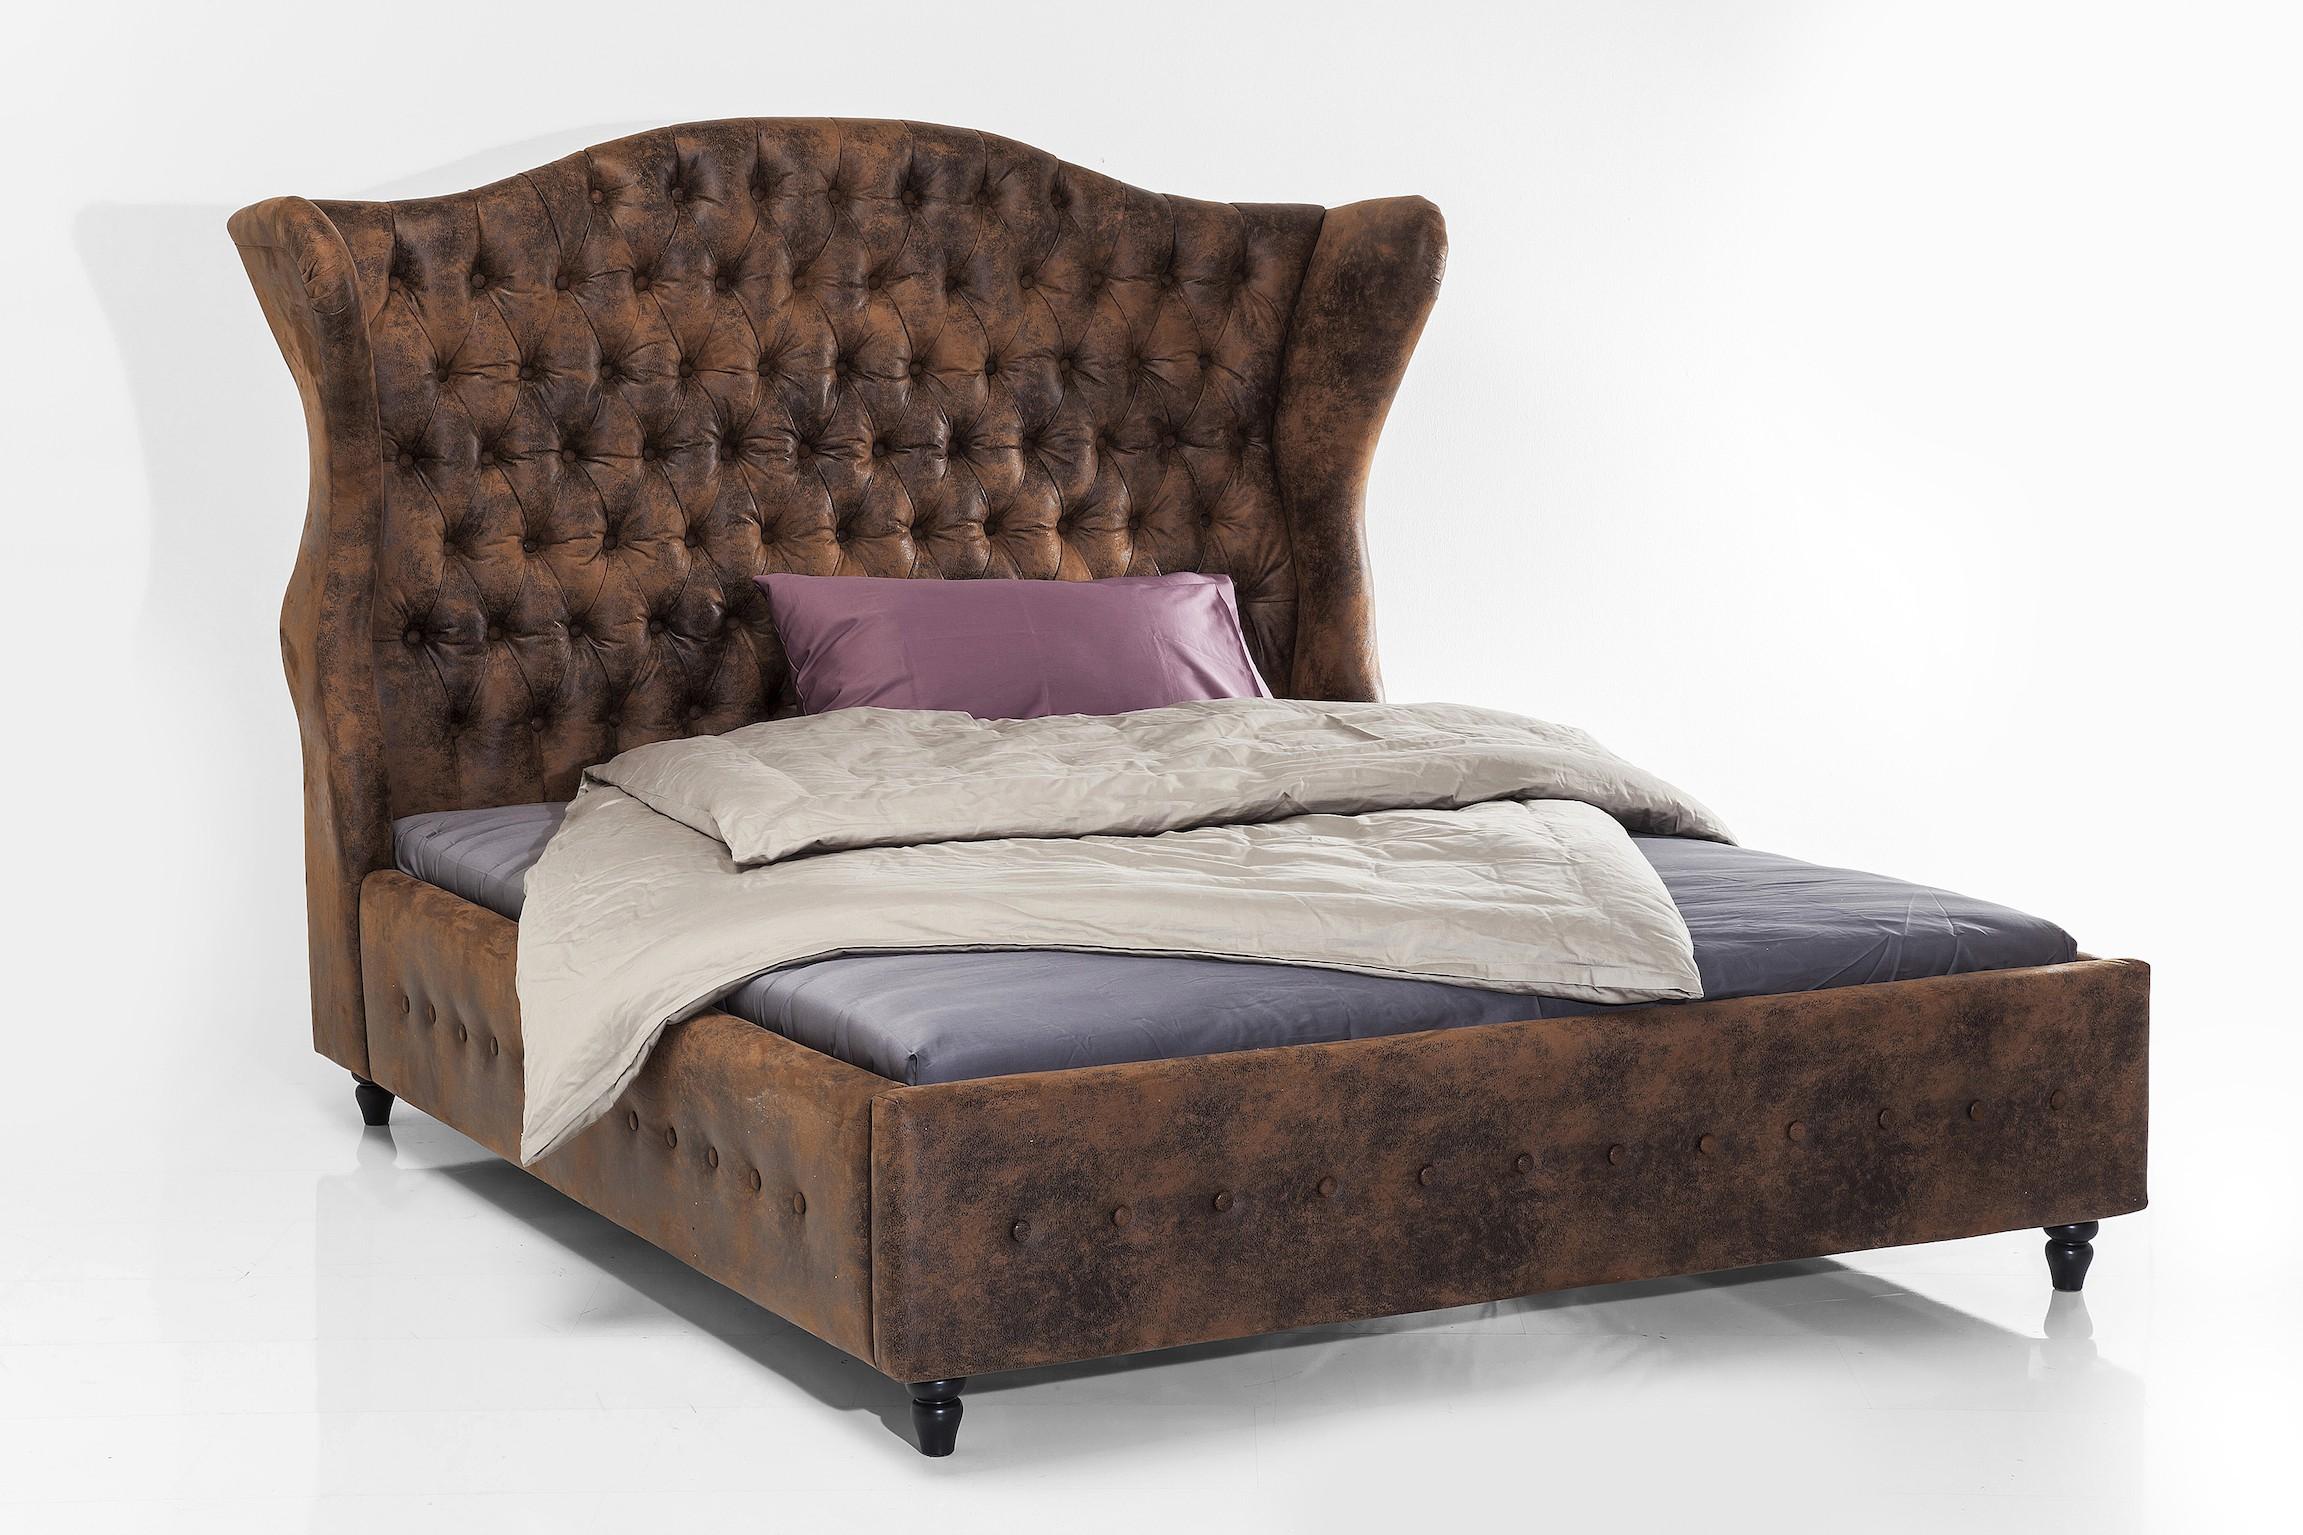 bett city spirit vintage 160 x 200 cm. Black Bedroom Furniture Sets. Home Design Ideas